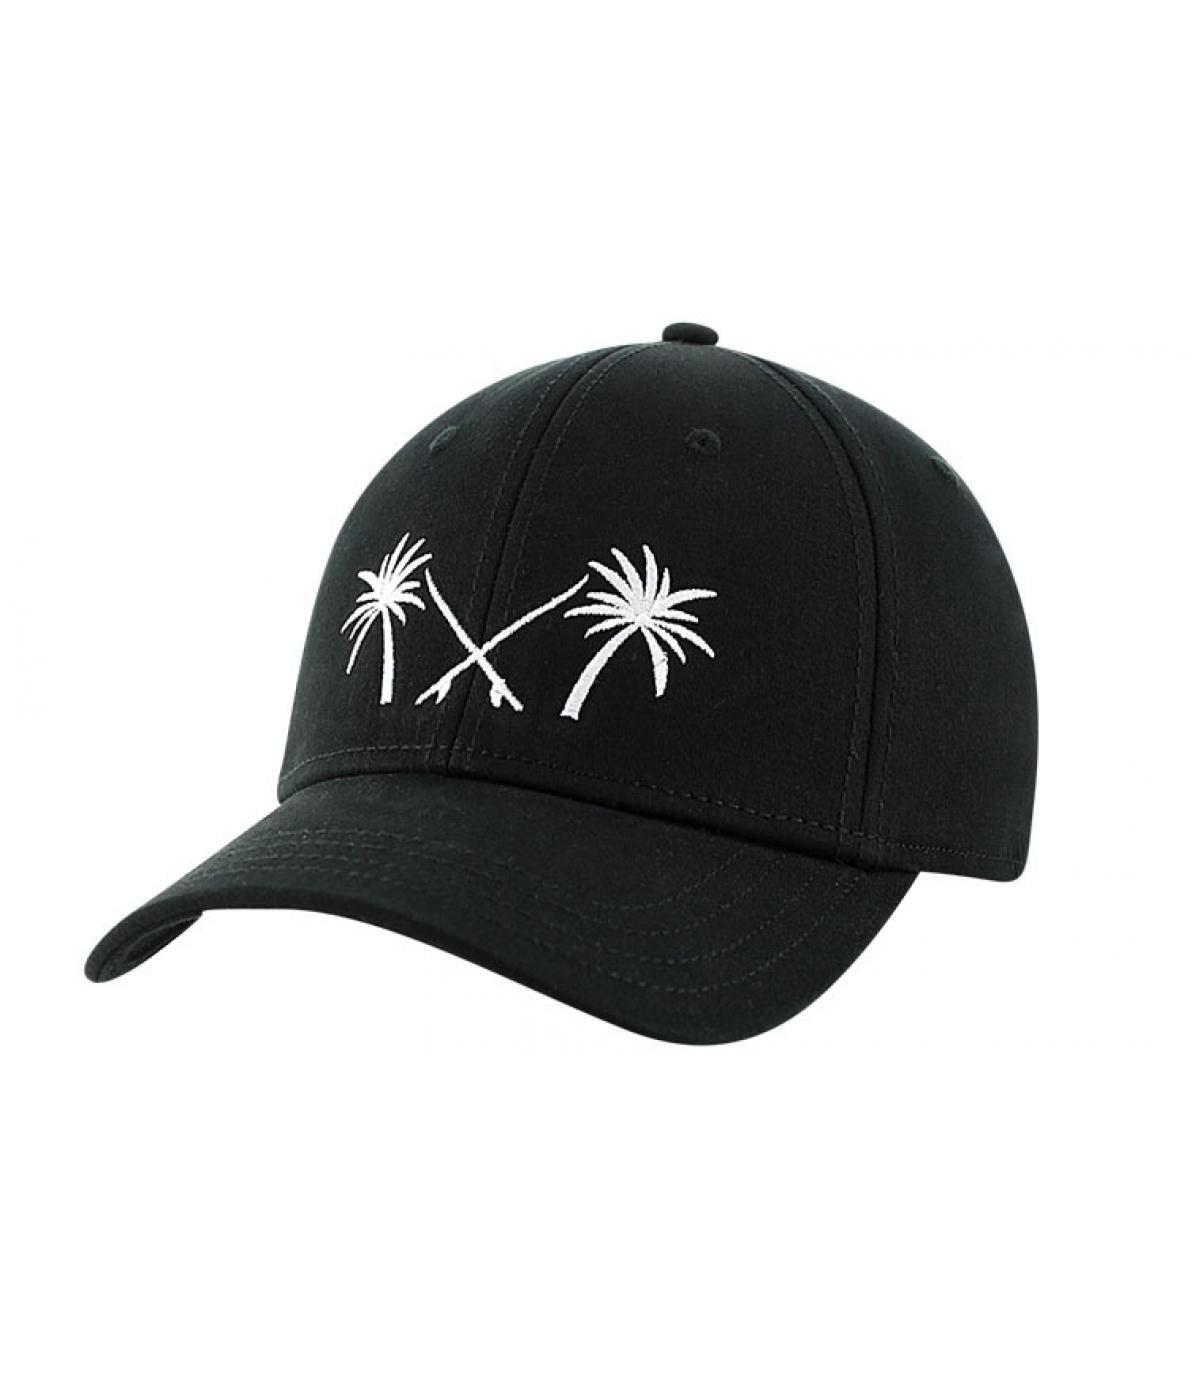 Gorra California negro